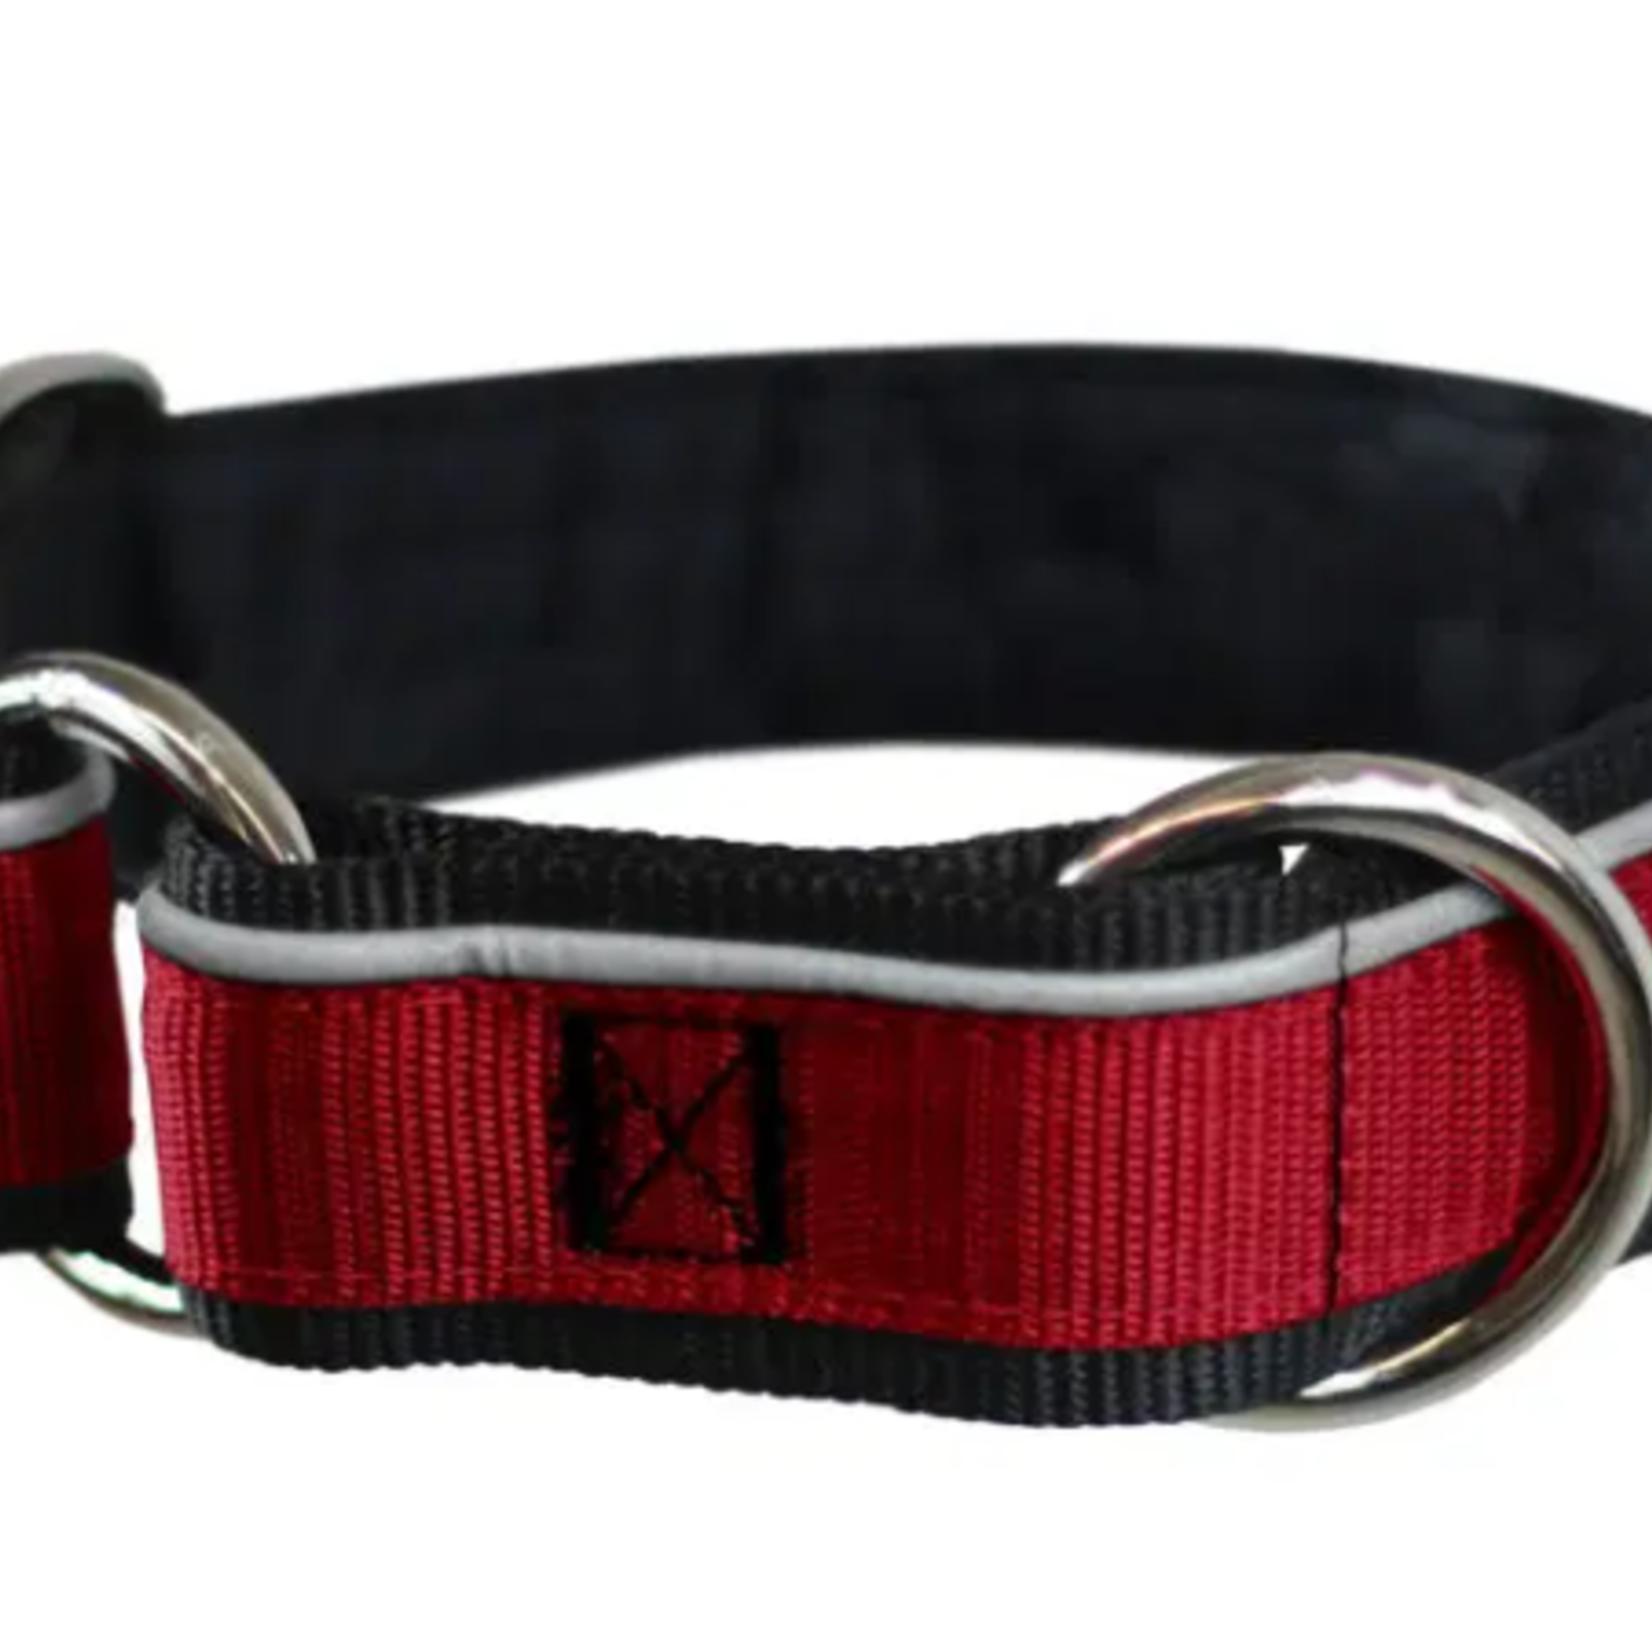 Nahak Padded Dog Collar With Reflective Band